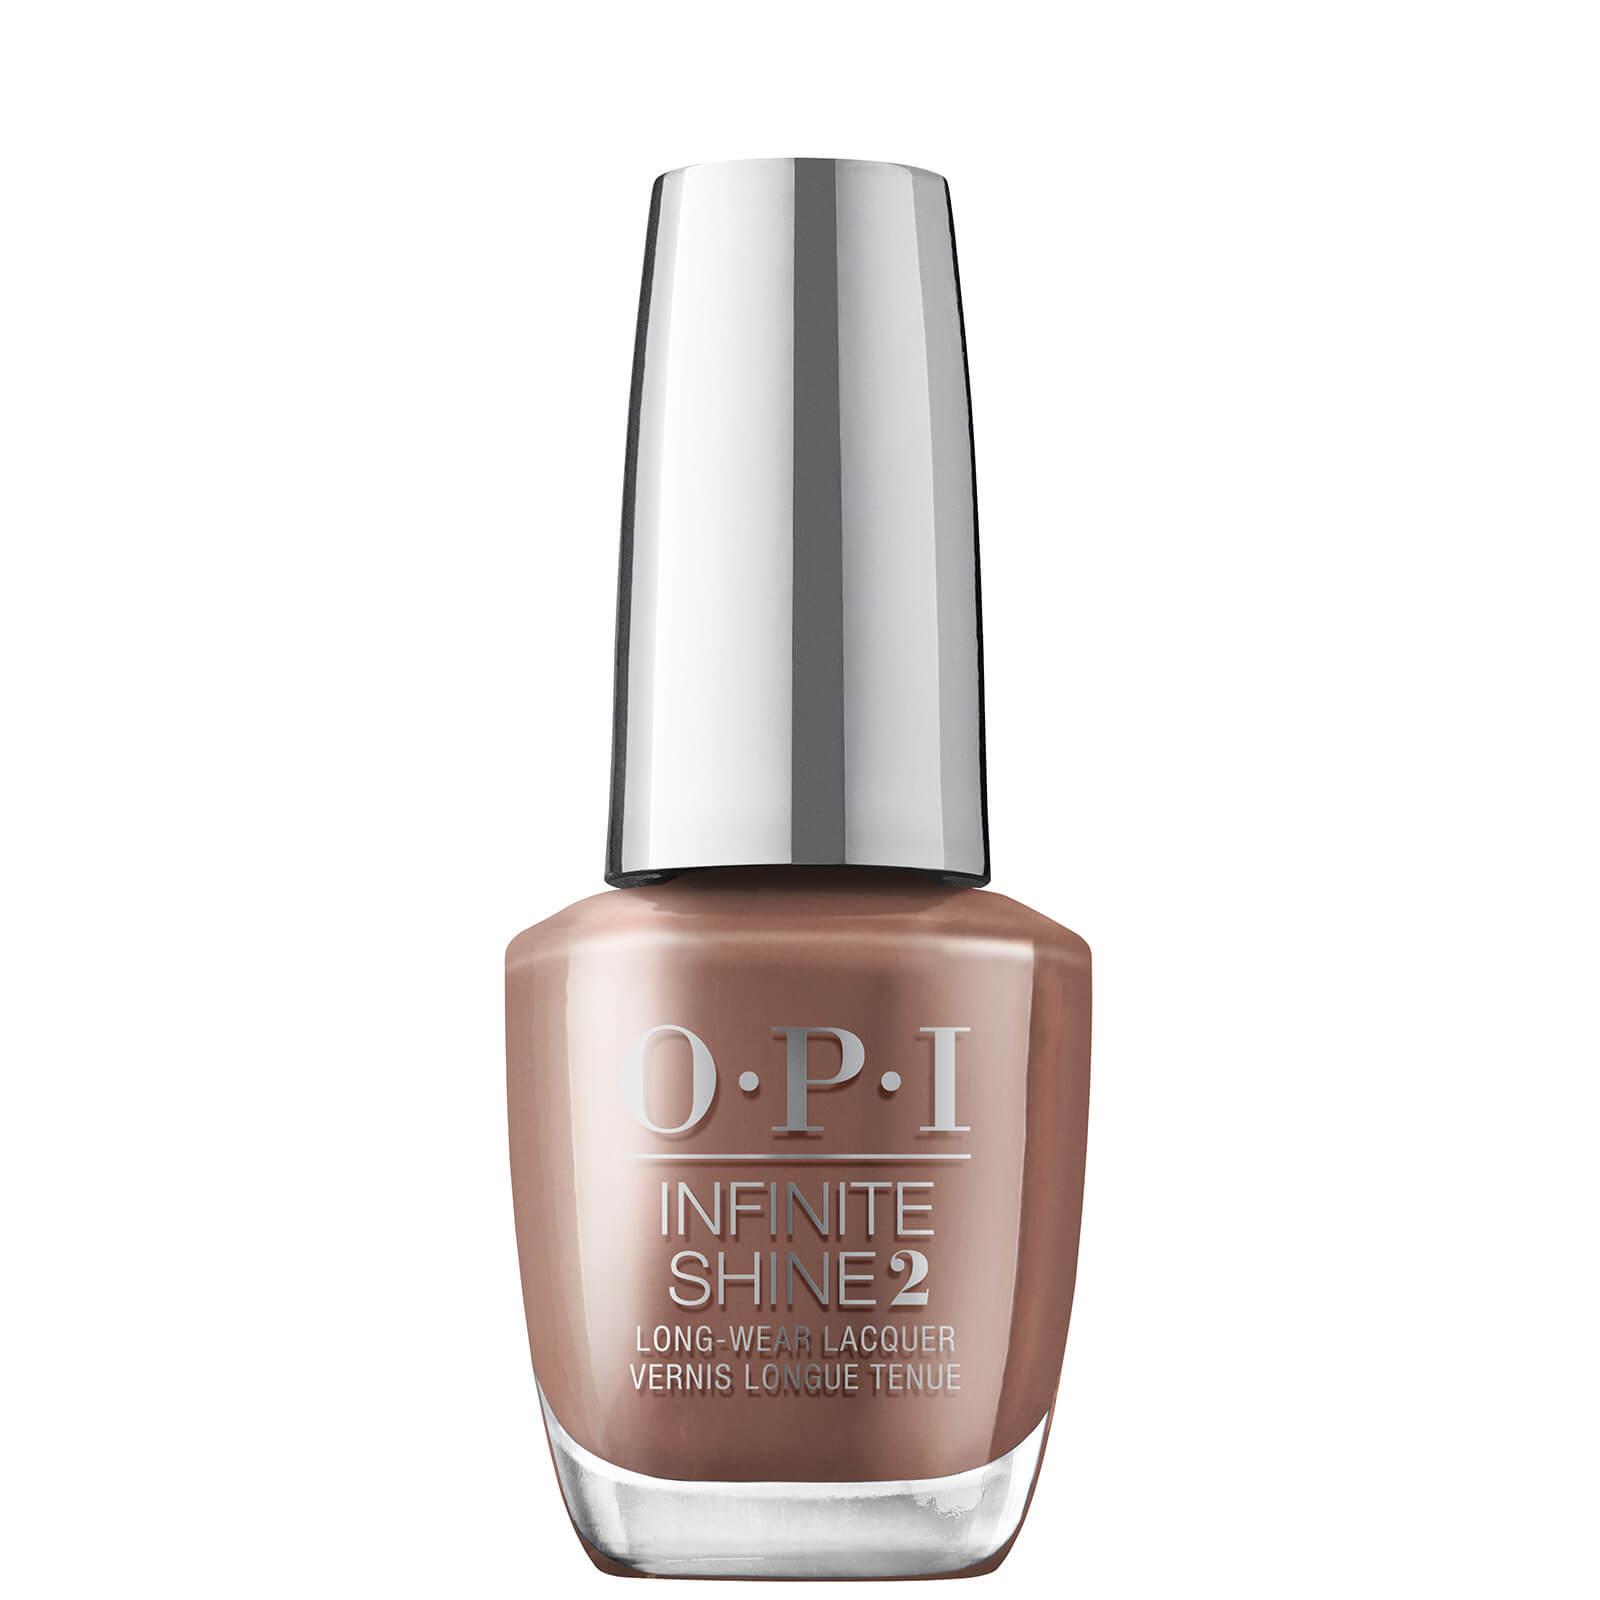 Купить OPI DTLA Collection Infinite Shine Long-wear Nail Polish 15ml (Various Shades) - Espresso Your Inner Self